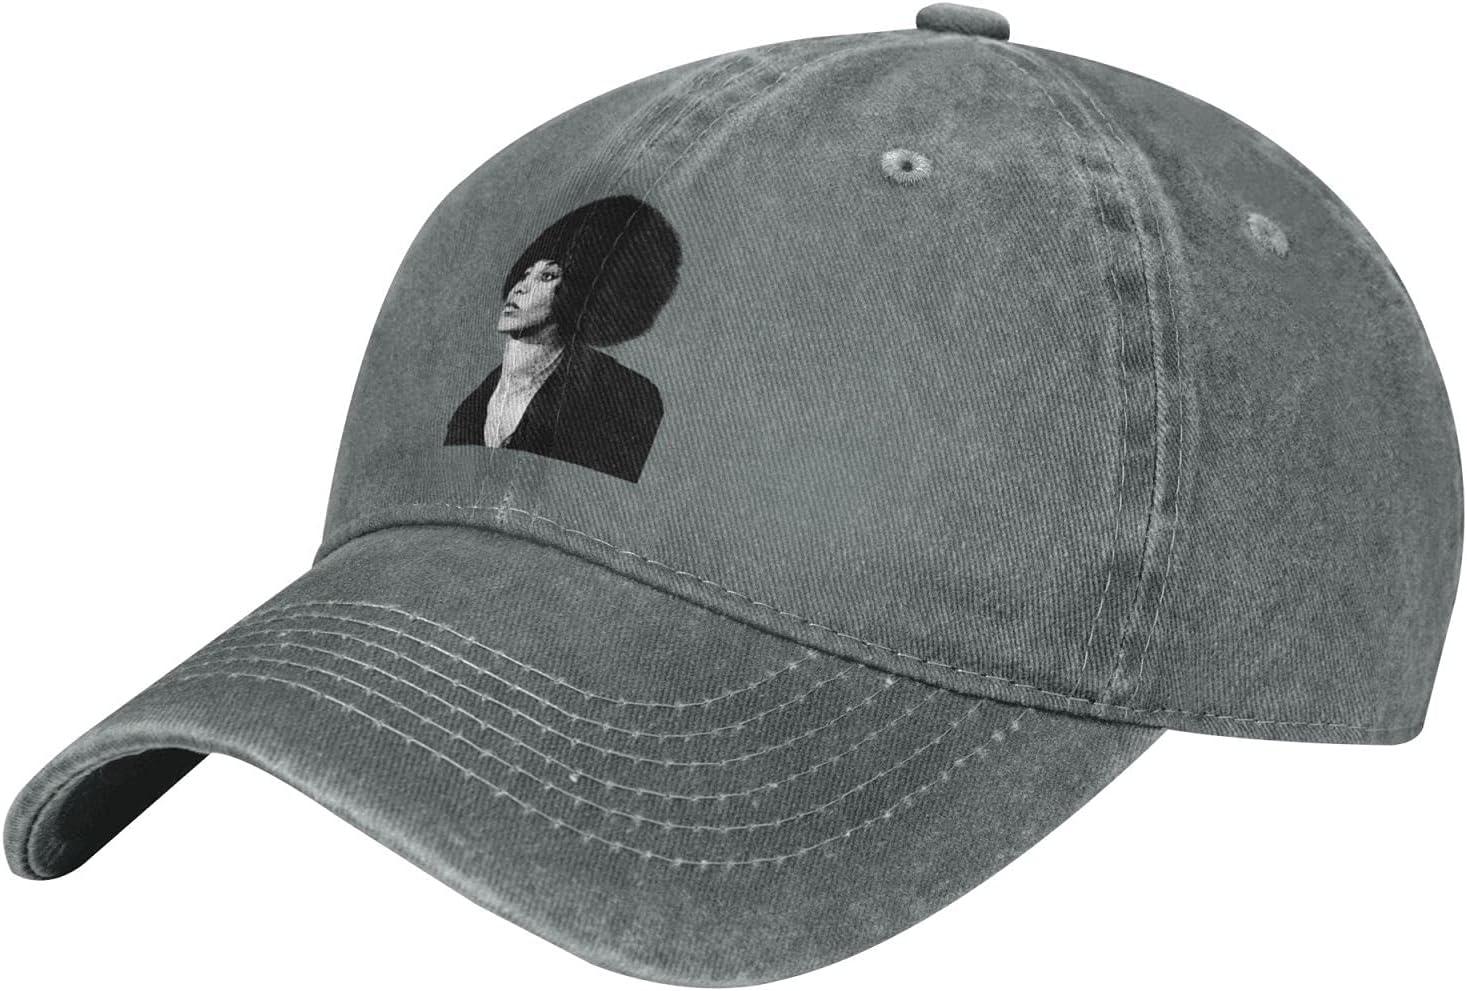 Pcaocmro Angela Davis Cowboy Hat Unisex Adjustable Hat Circumference Size Pure Cotton Denim Wash Water Outdoor